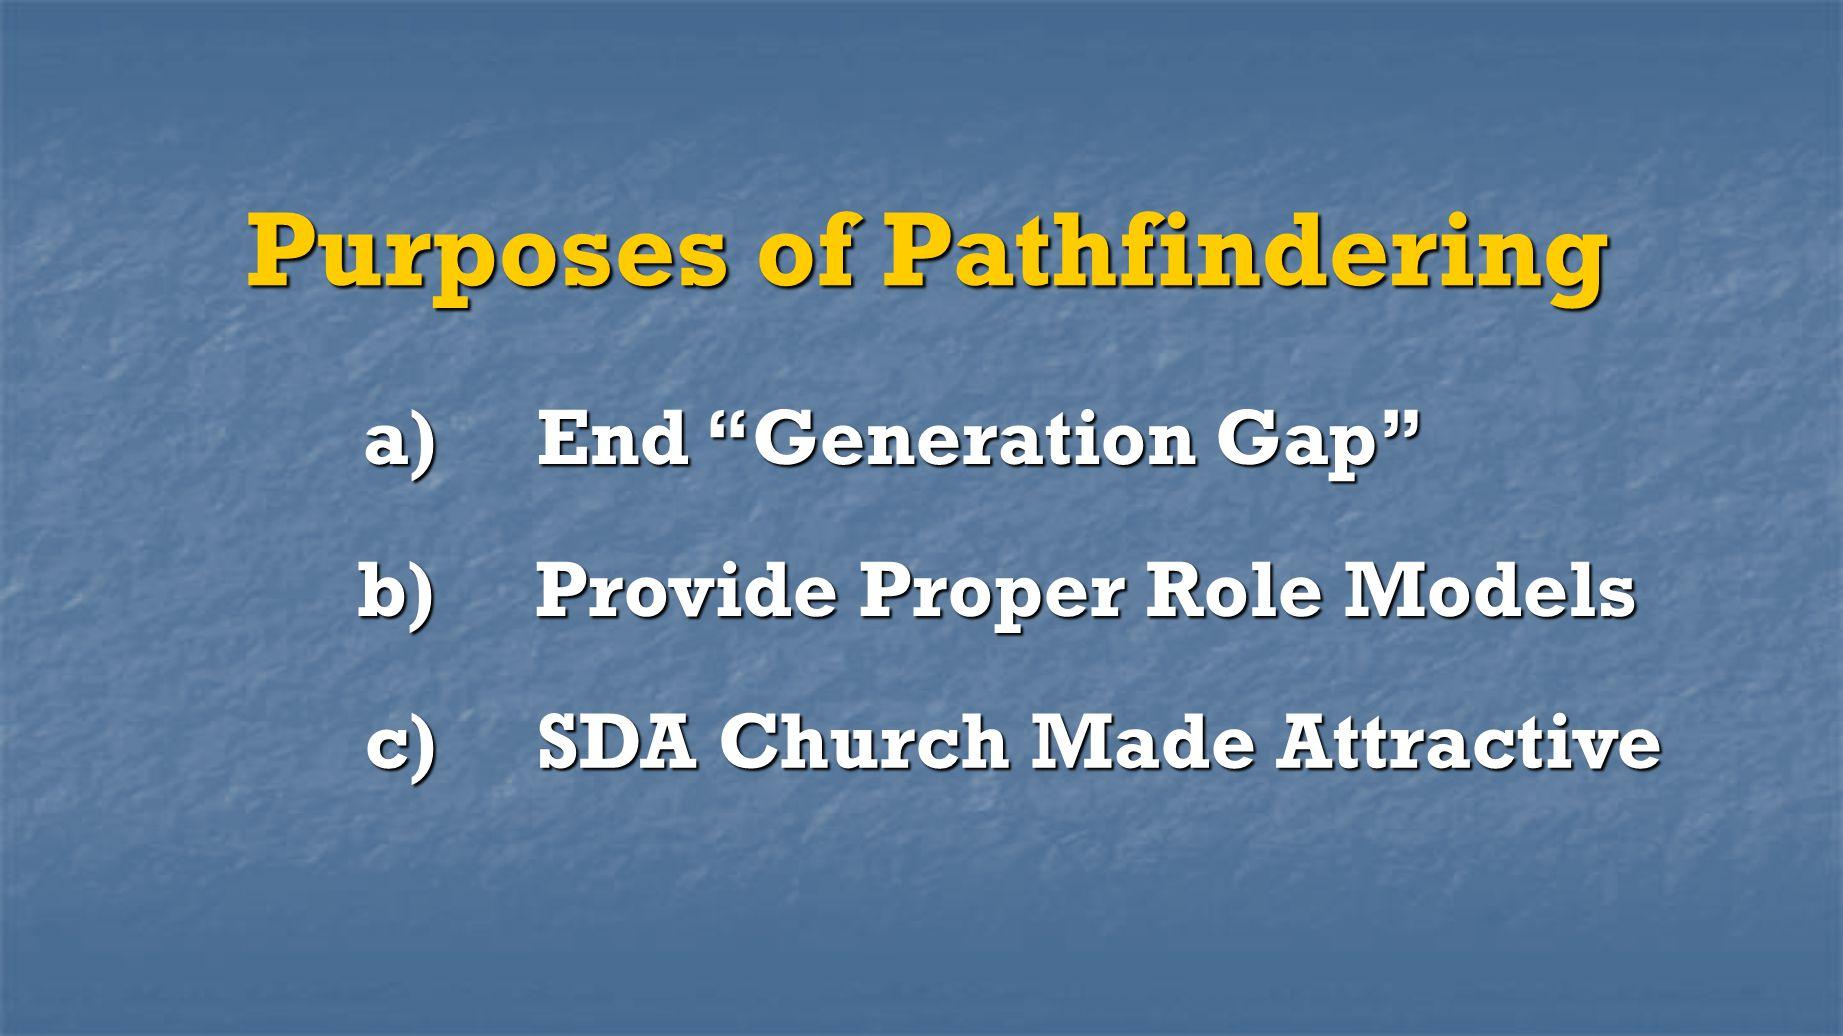 Purposes of Pathfindering